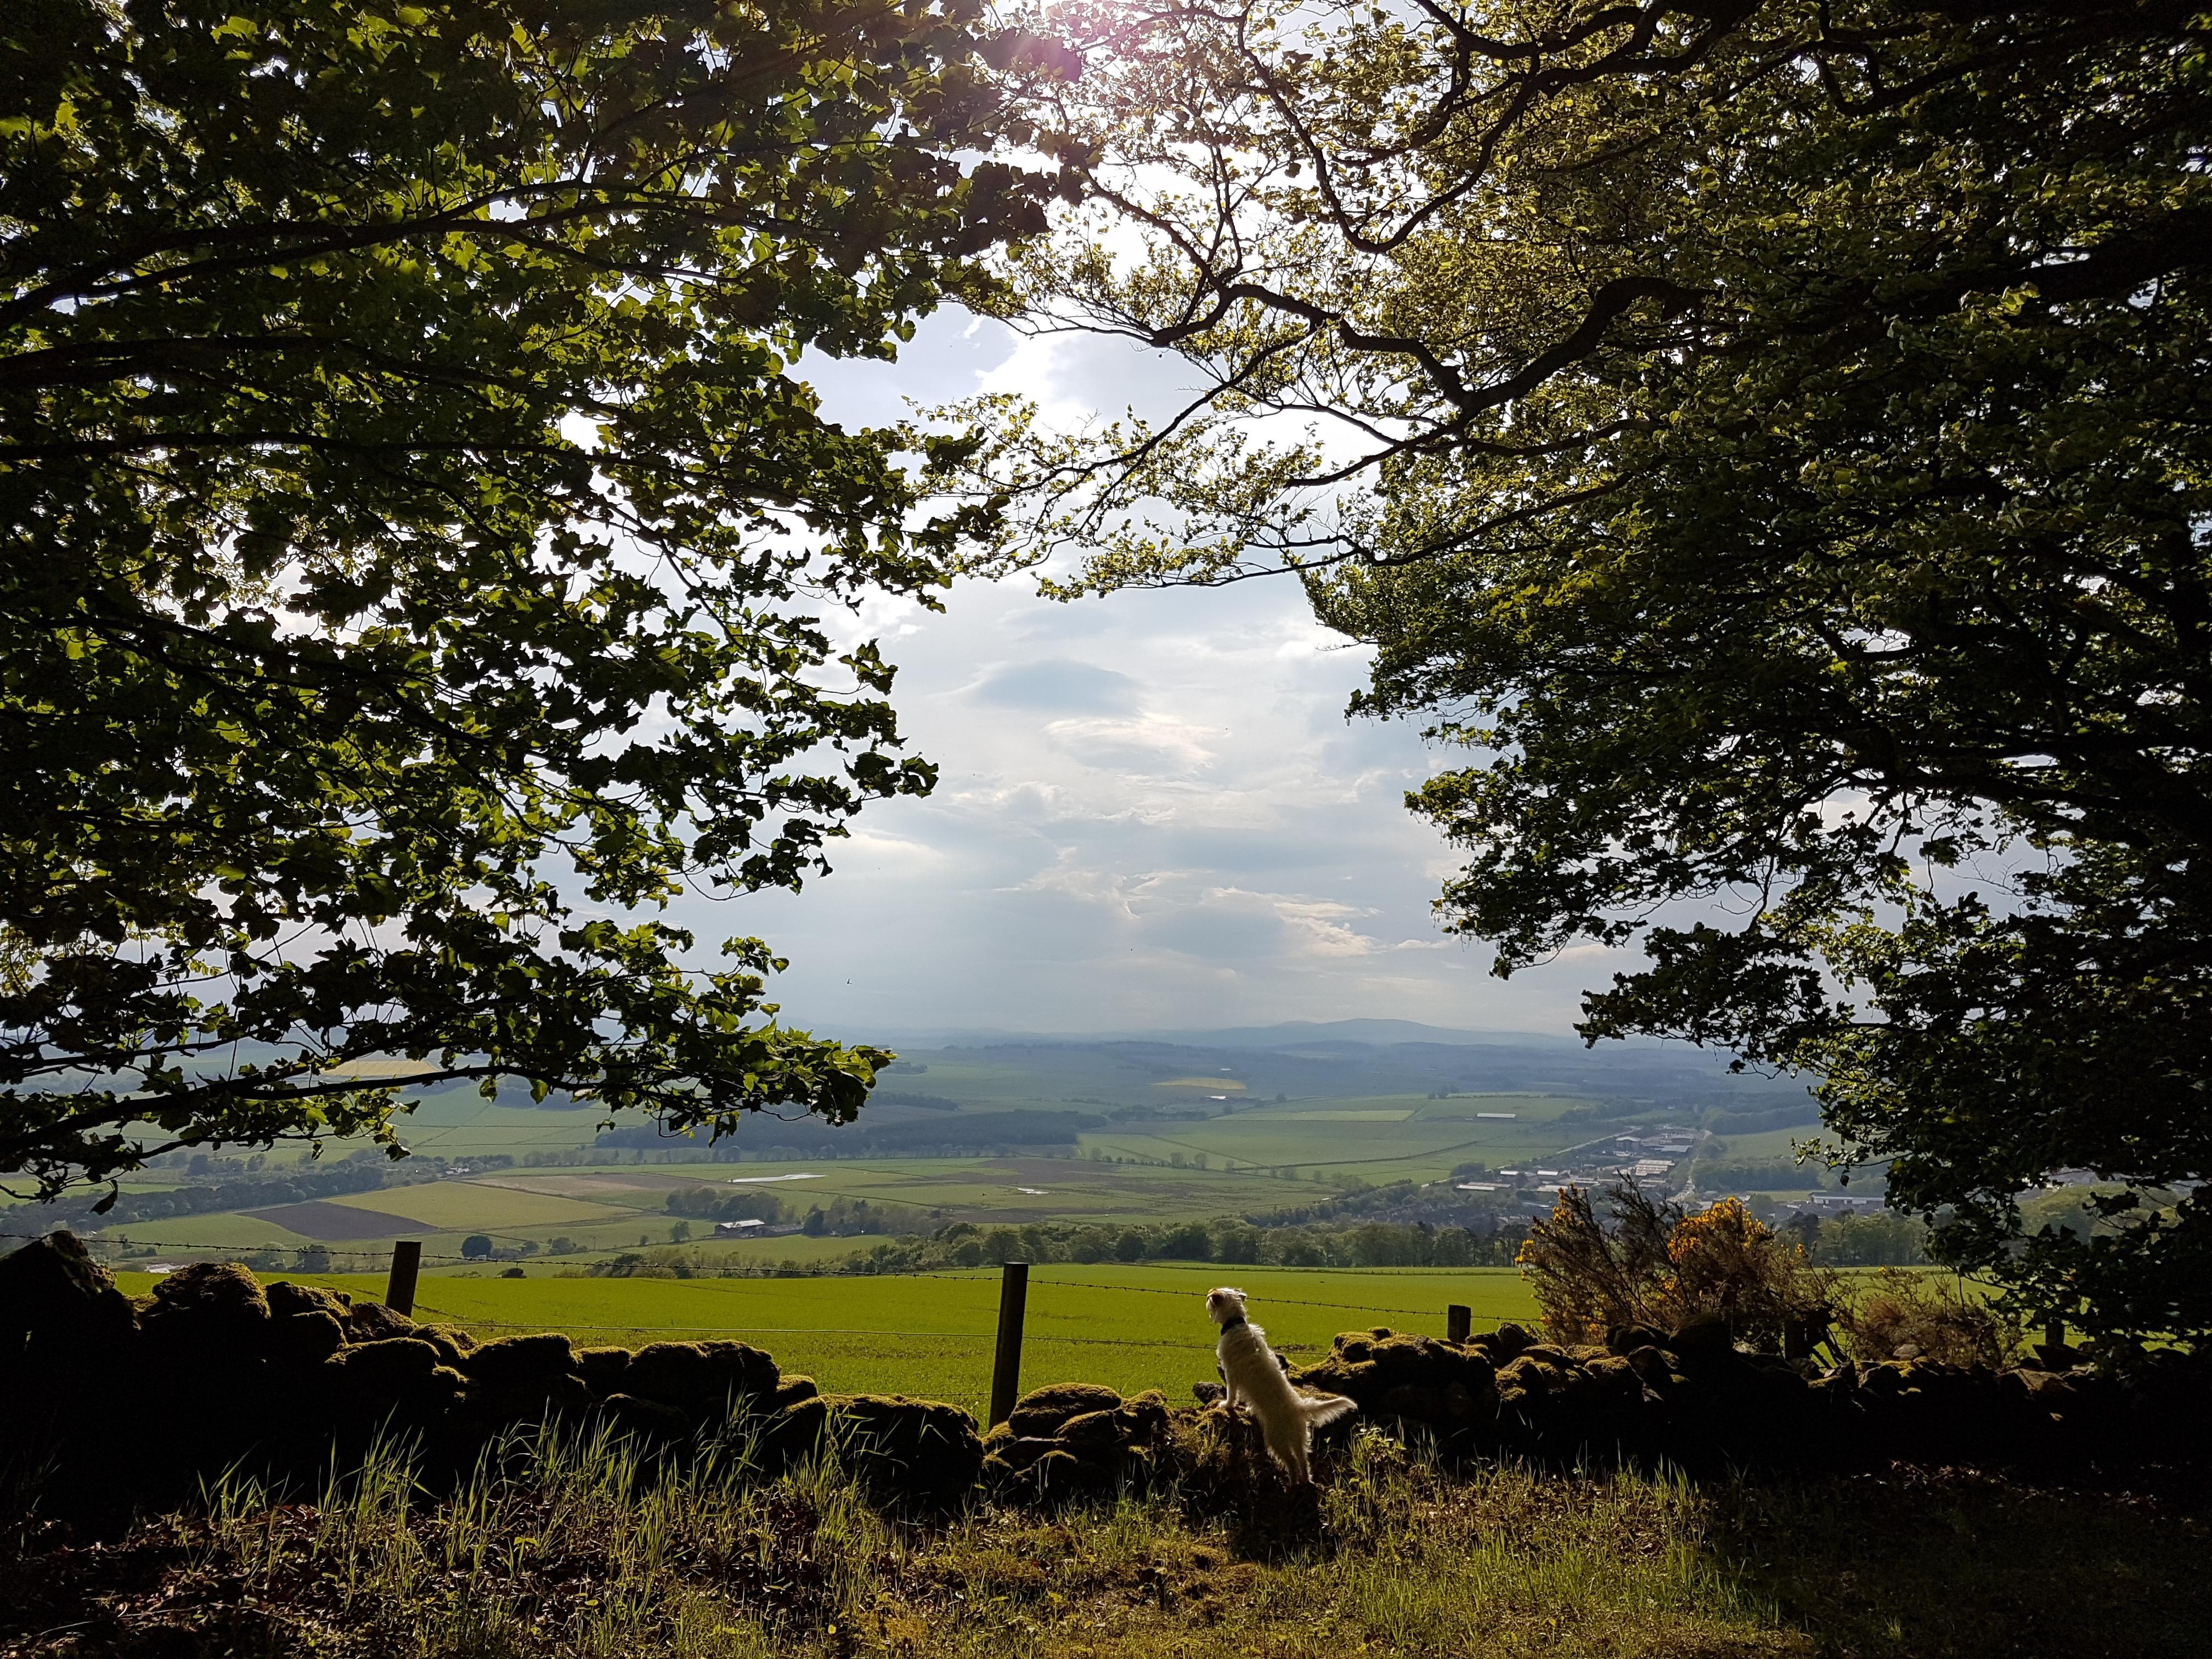 Unedited Pic From The Edge Of Kirkhill Forest Aberdeenshire 40323024 Oc Https Ift Tt 2tnmsj7 Forest Aberdeenshire Pics